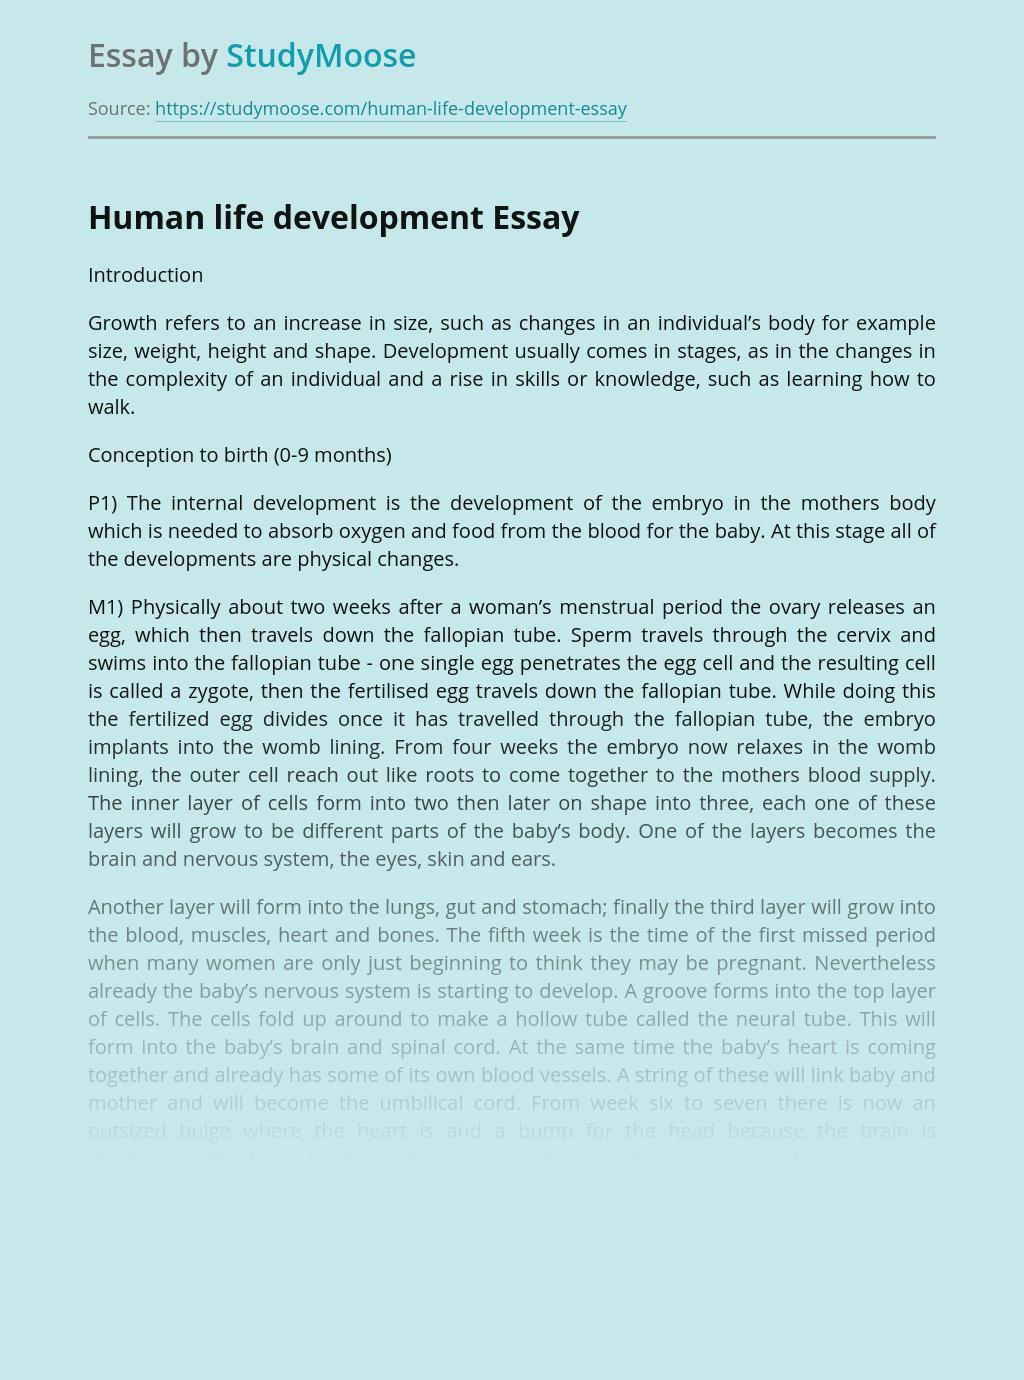 Human life development